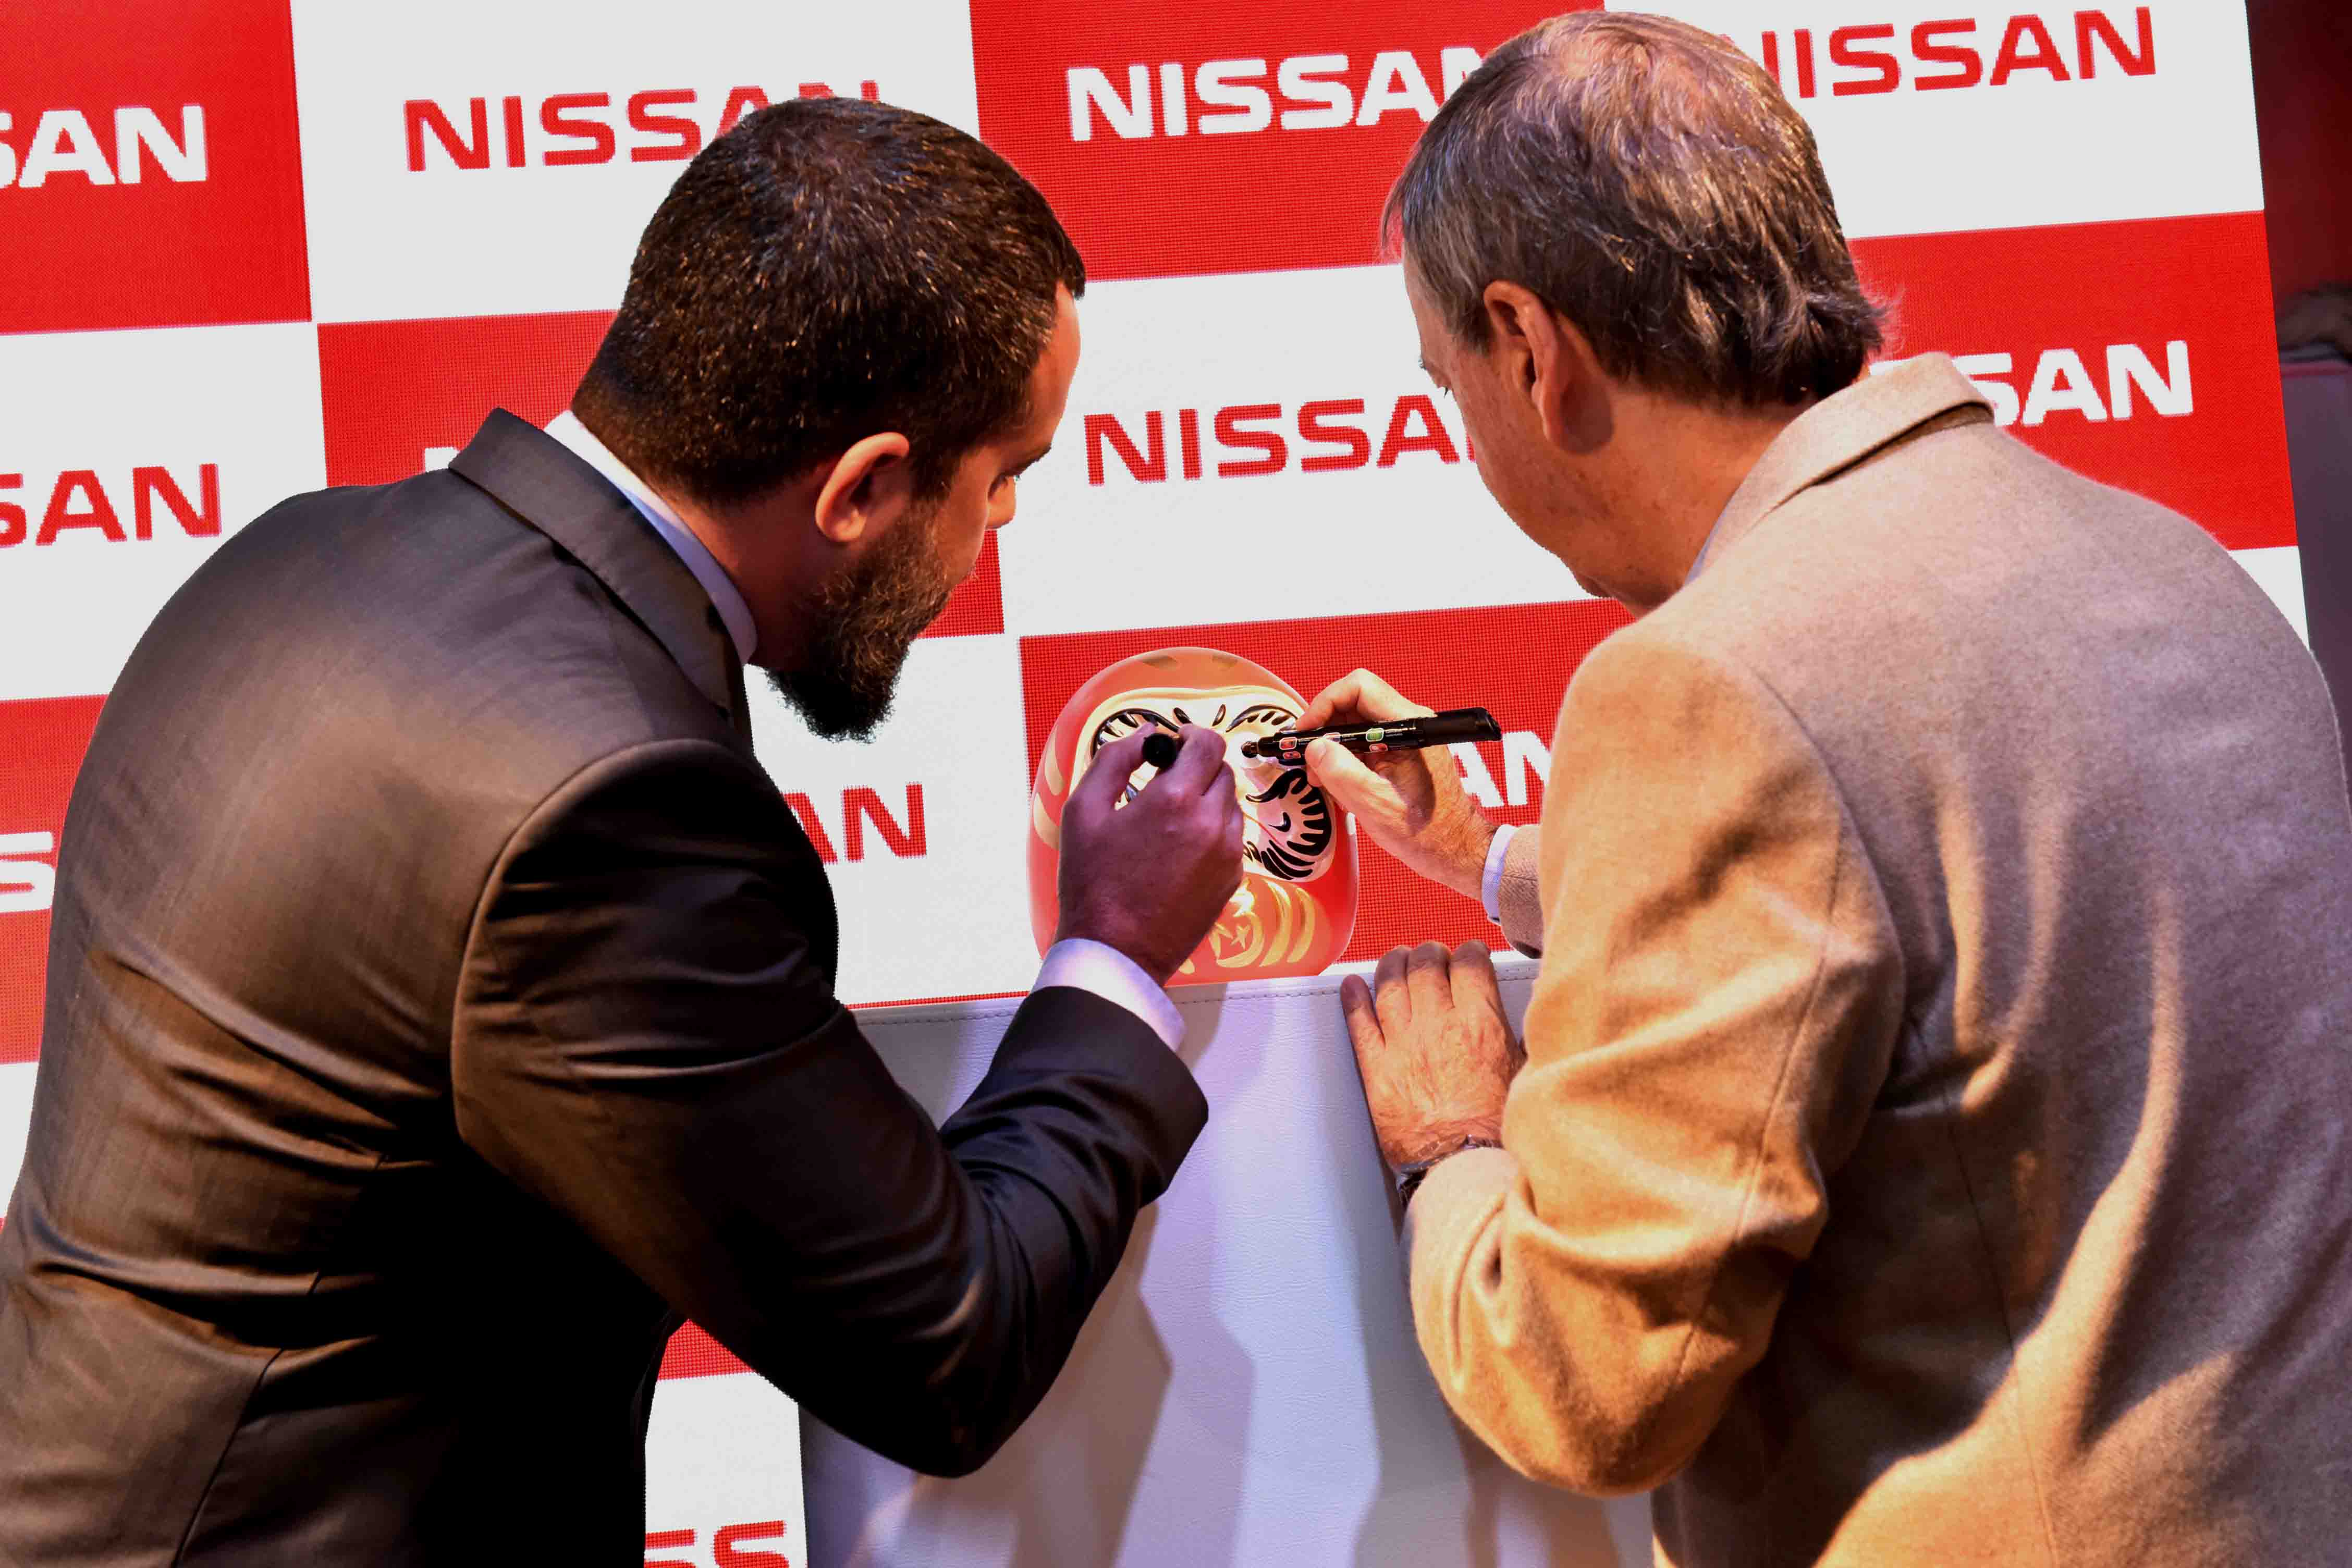 Ceremonia del Daruma con J. Schiaretti, Gobernador de Córdoba y Diego Vignati, Director General de Nissan Argentina